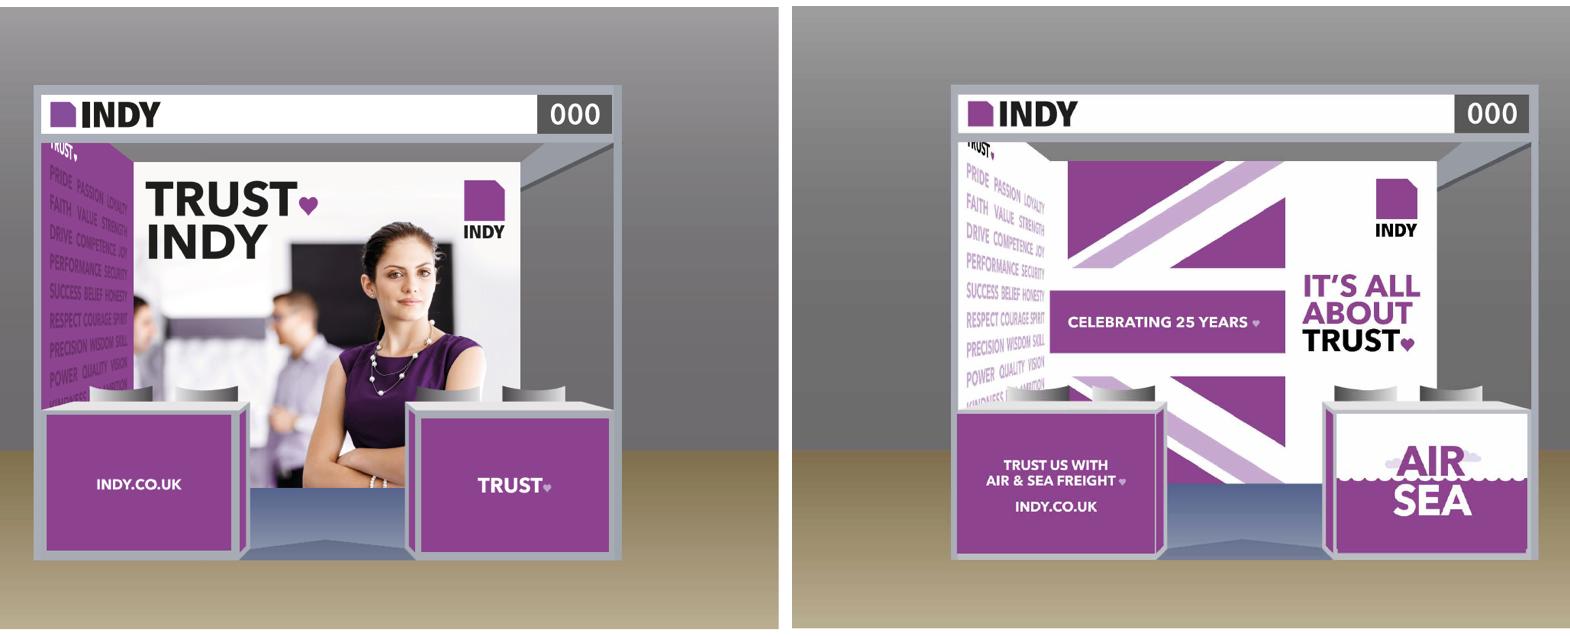 Exhibition Booth Graphics : Exhibition booth graphics